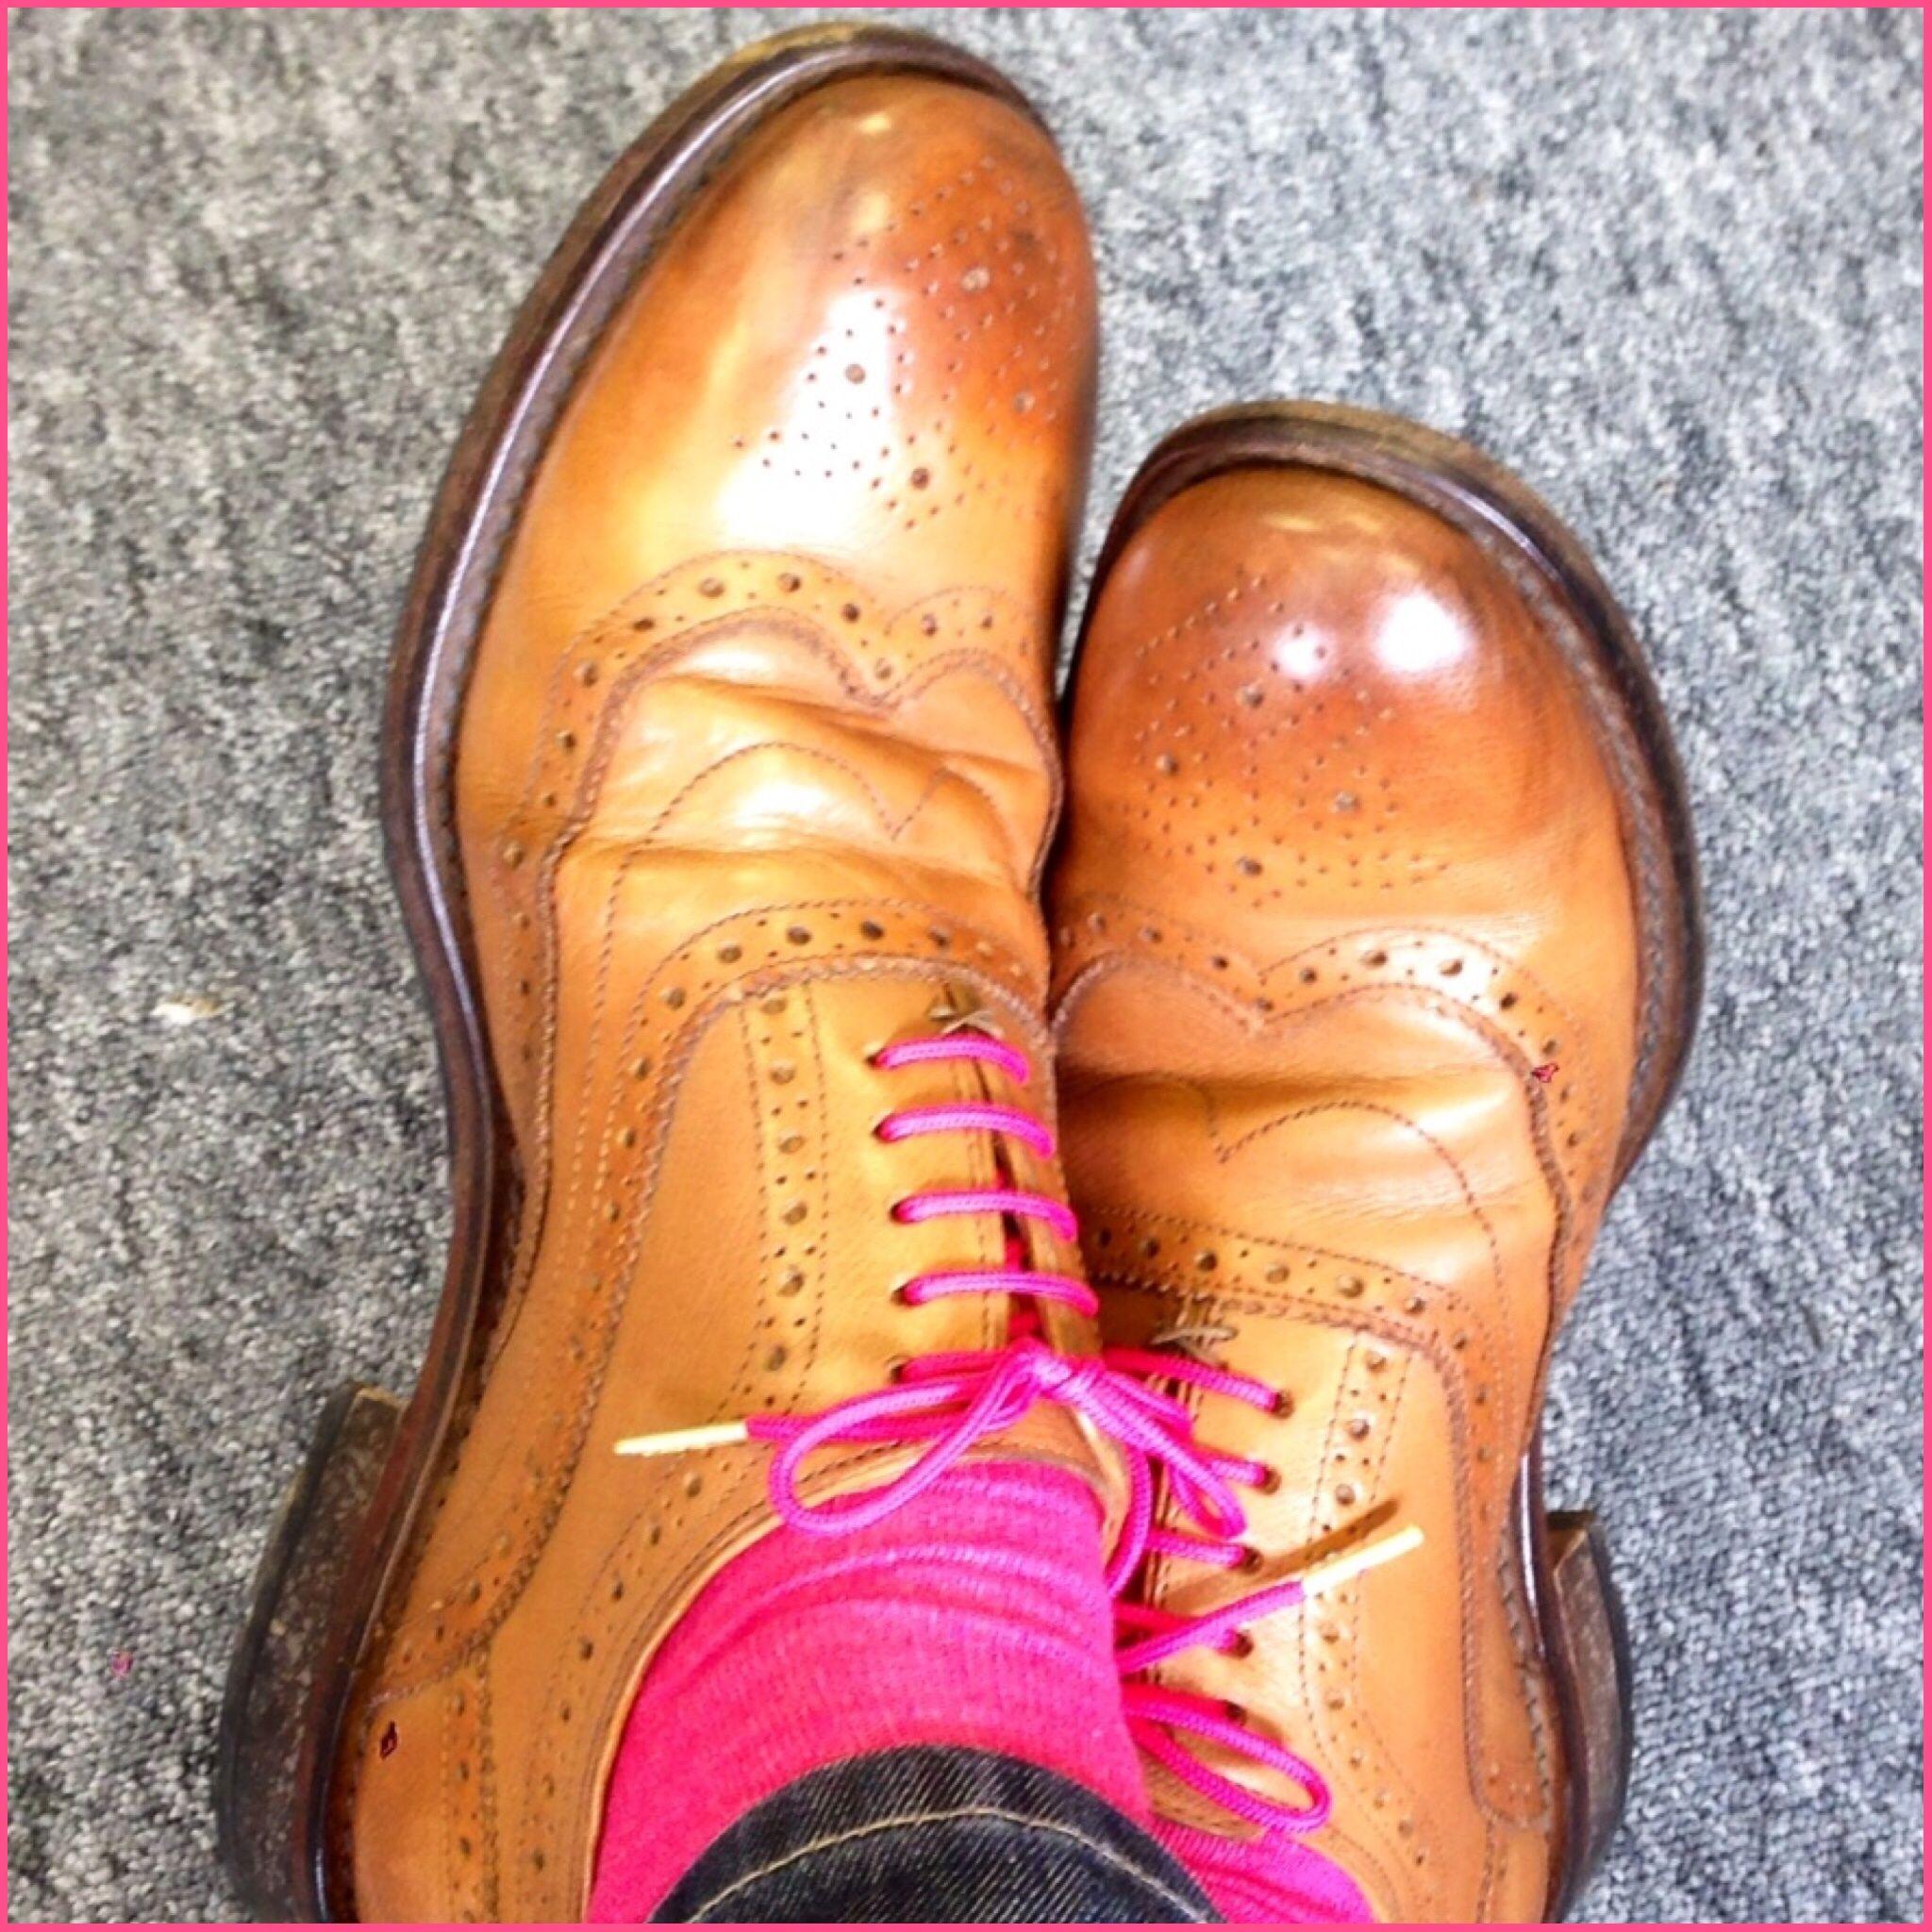 portabud | Tan shoes, Pink shoelaces